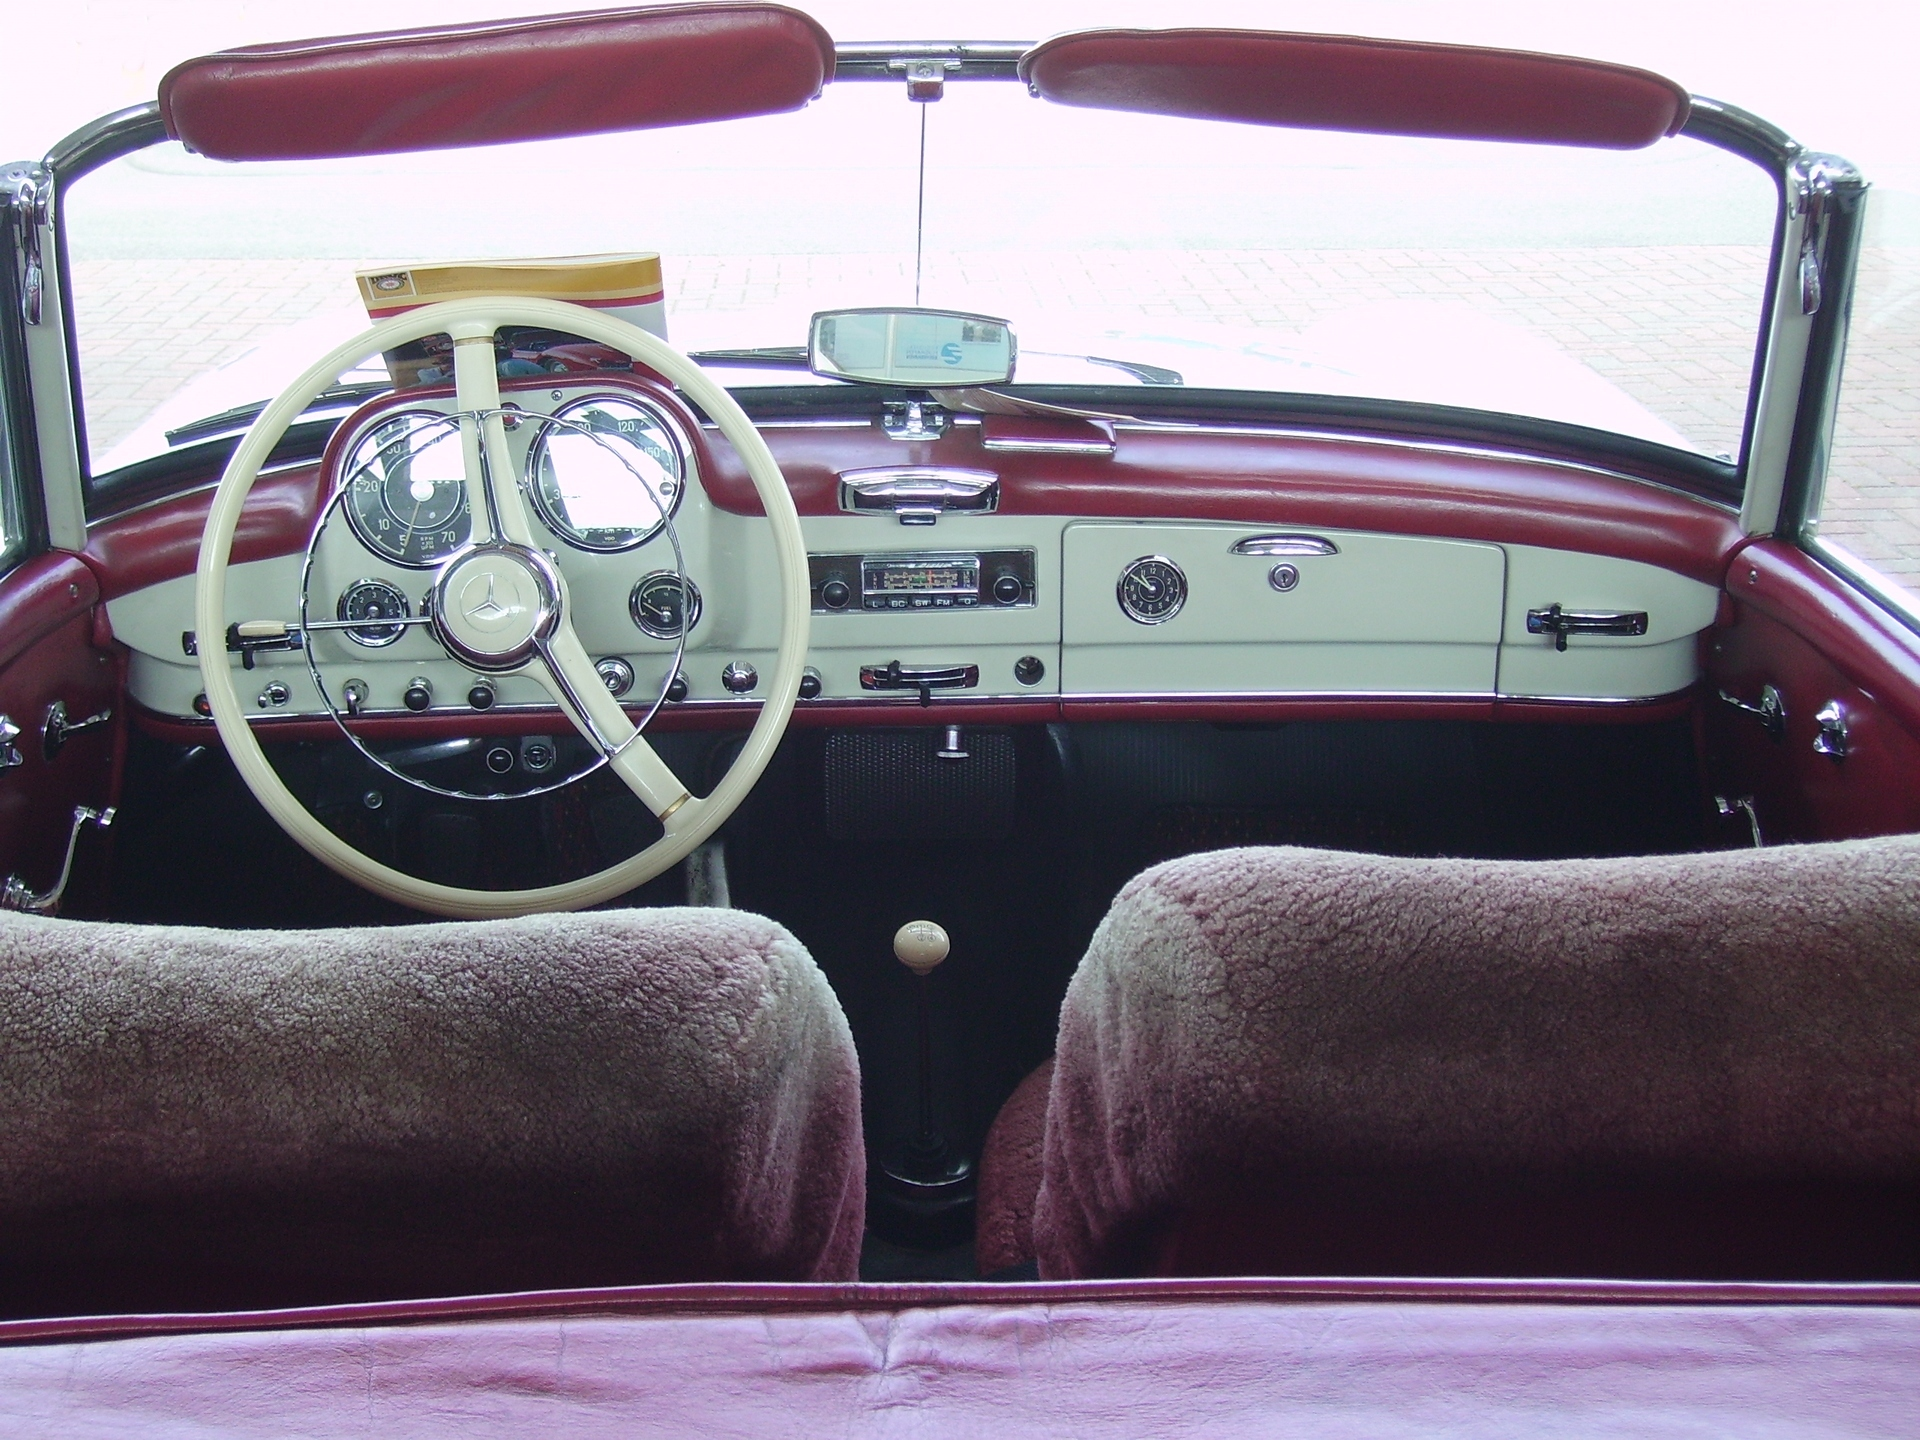 File:Interior Mercedes-Benz 190 SL.jpg - Wikimedia Commons